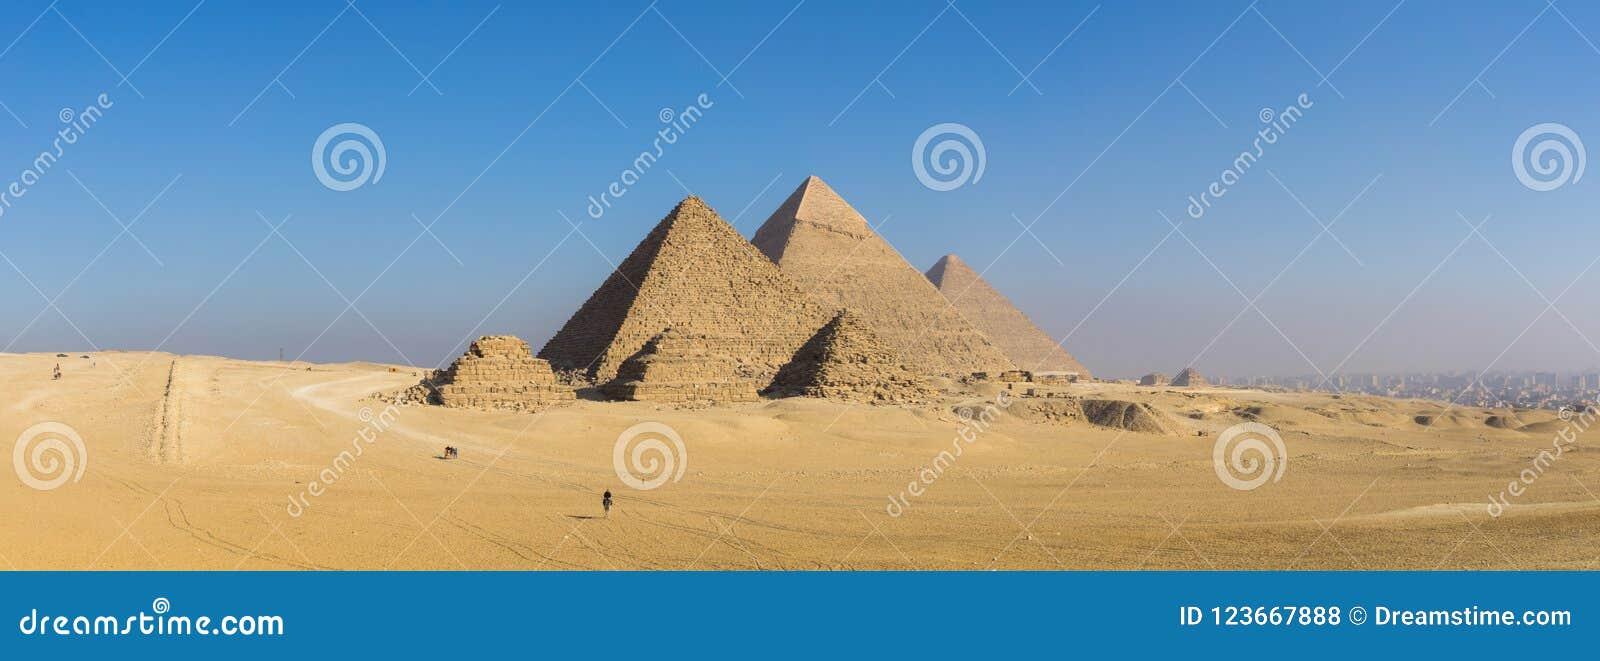 Den stora pyramiden av Giza och sfinxen, Kairo, Egypten